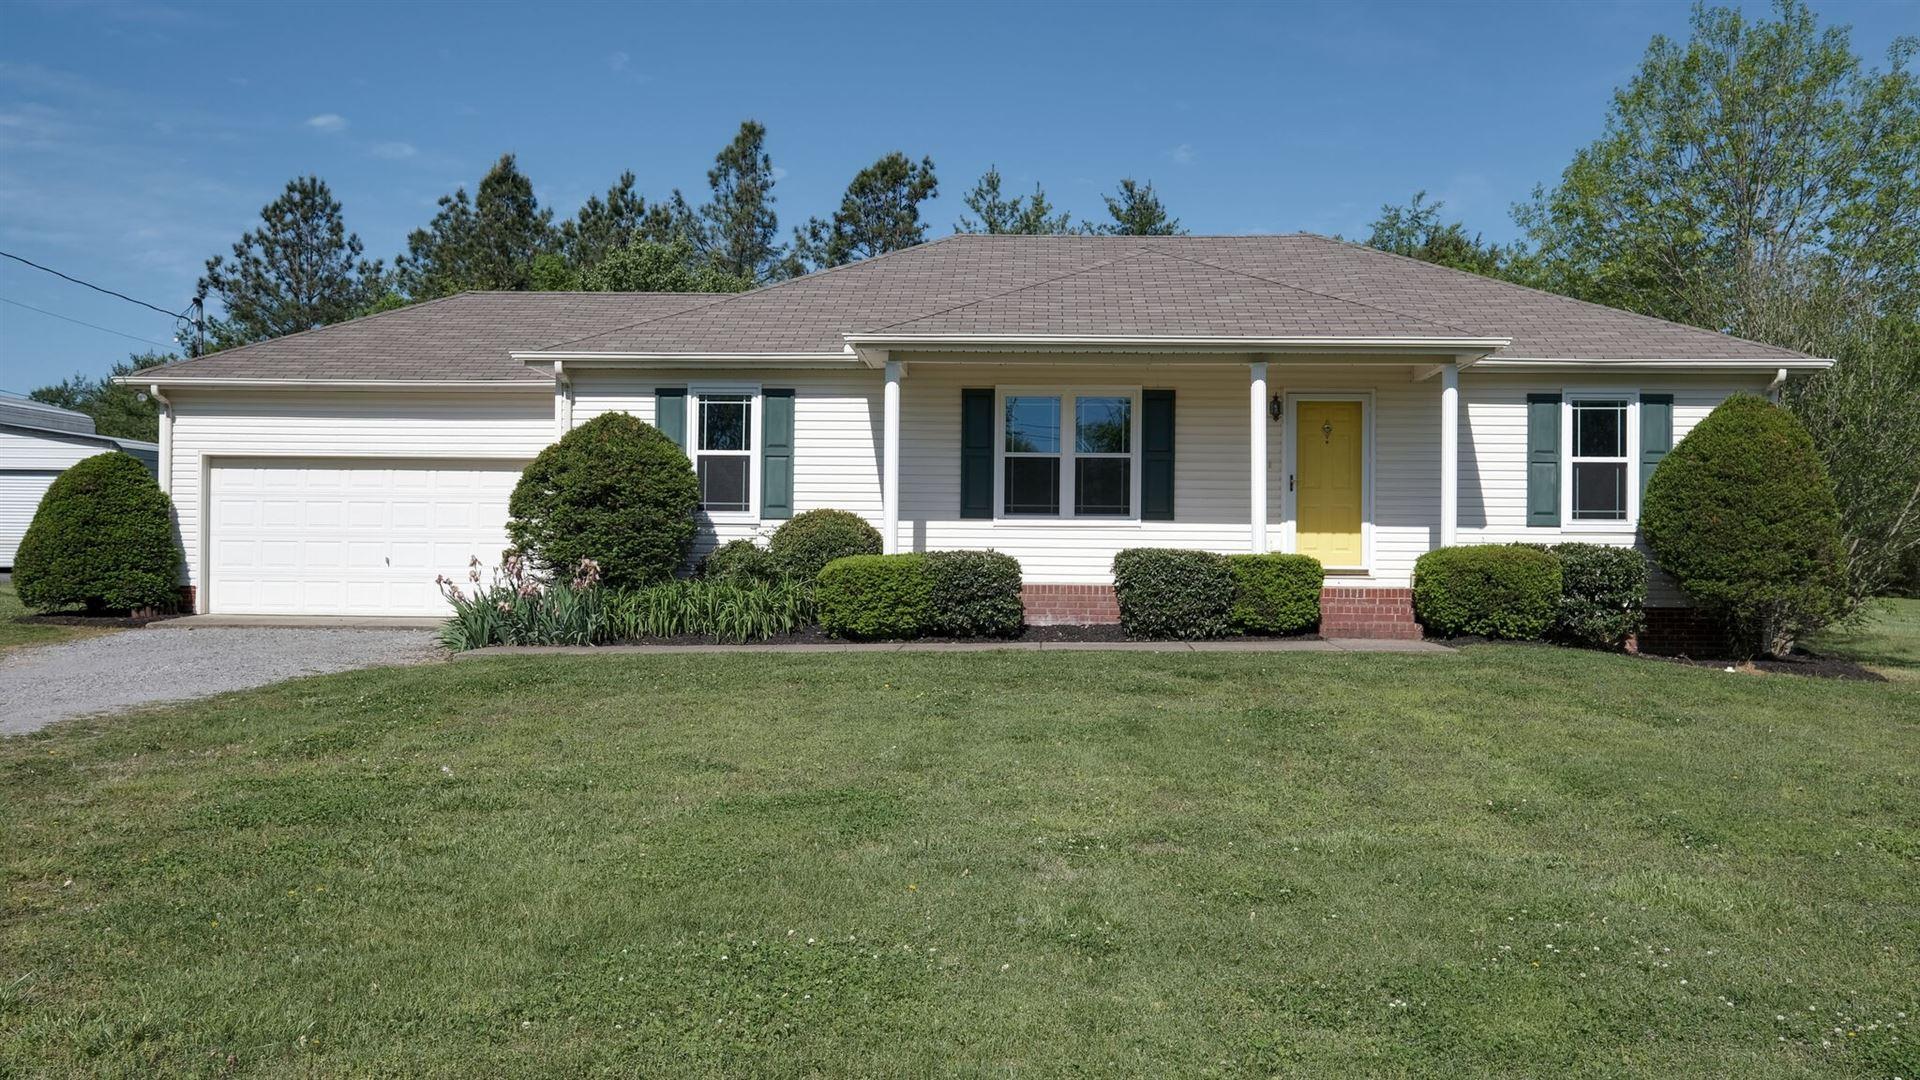 230 Conhocken Ct, Murfreesboro, TN 37128 - MLS#: 2252609